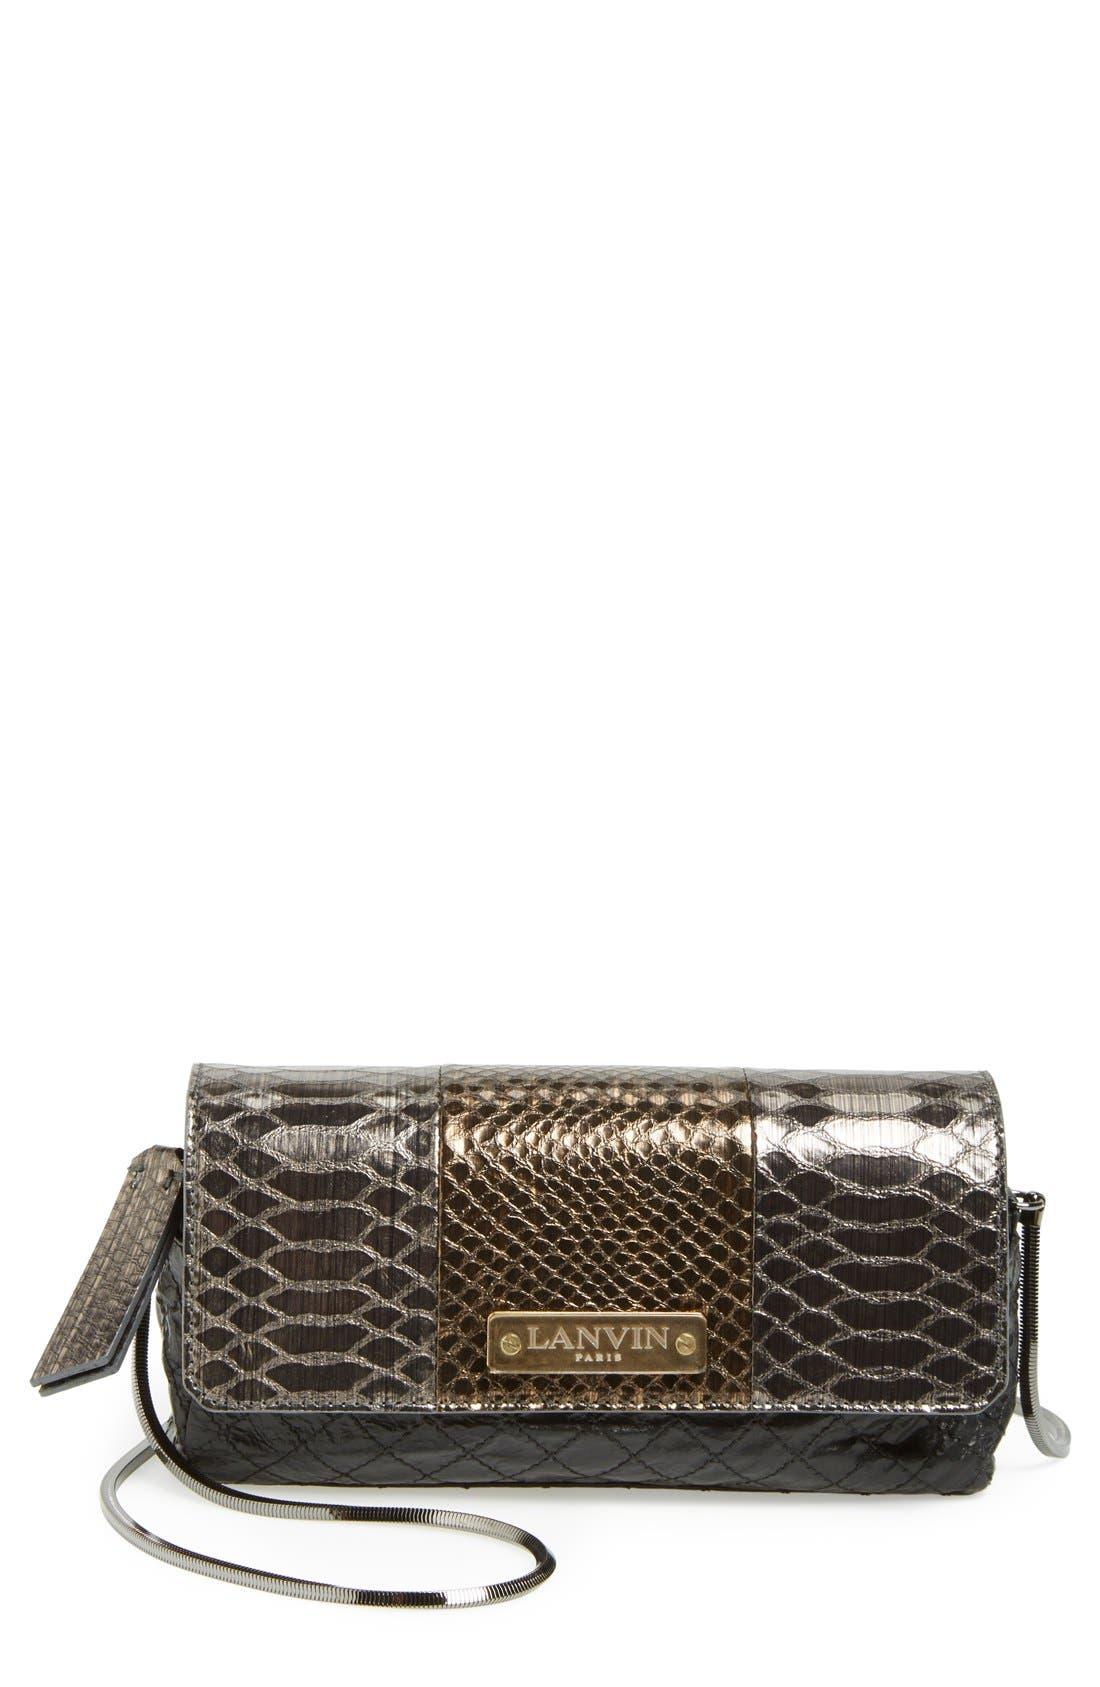 Alternate Image 1 Selected - Lanvin 'Small Paper Bag' Lambskin Shoulder Bag